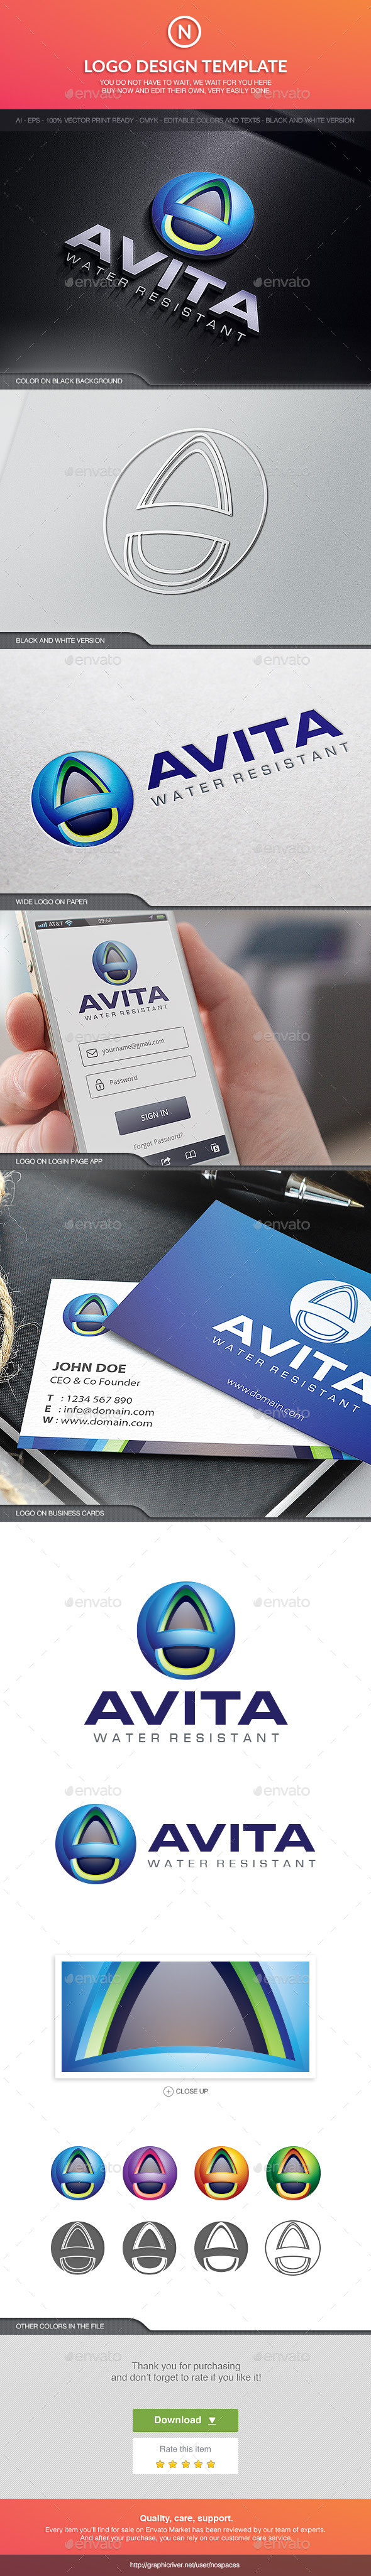 Avita Water - 3d Abstract